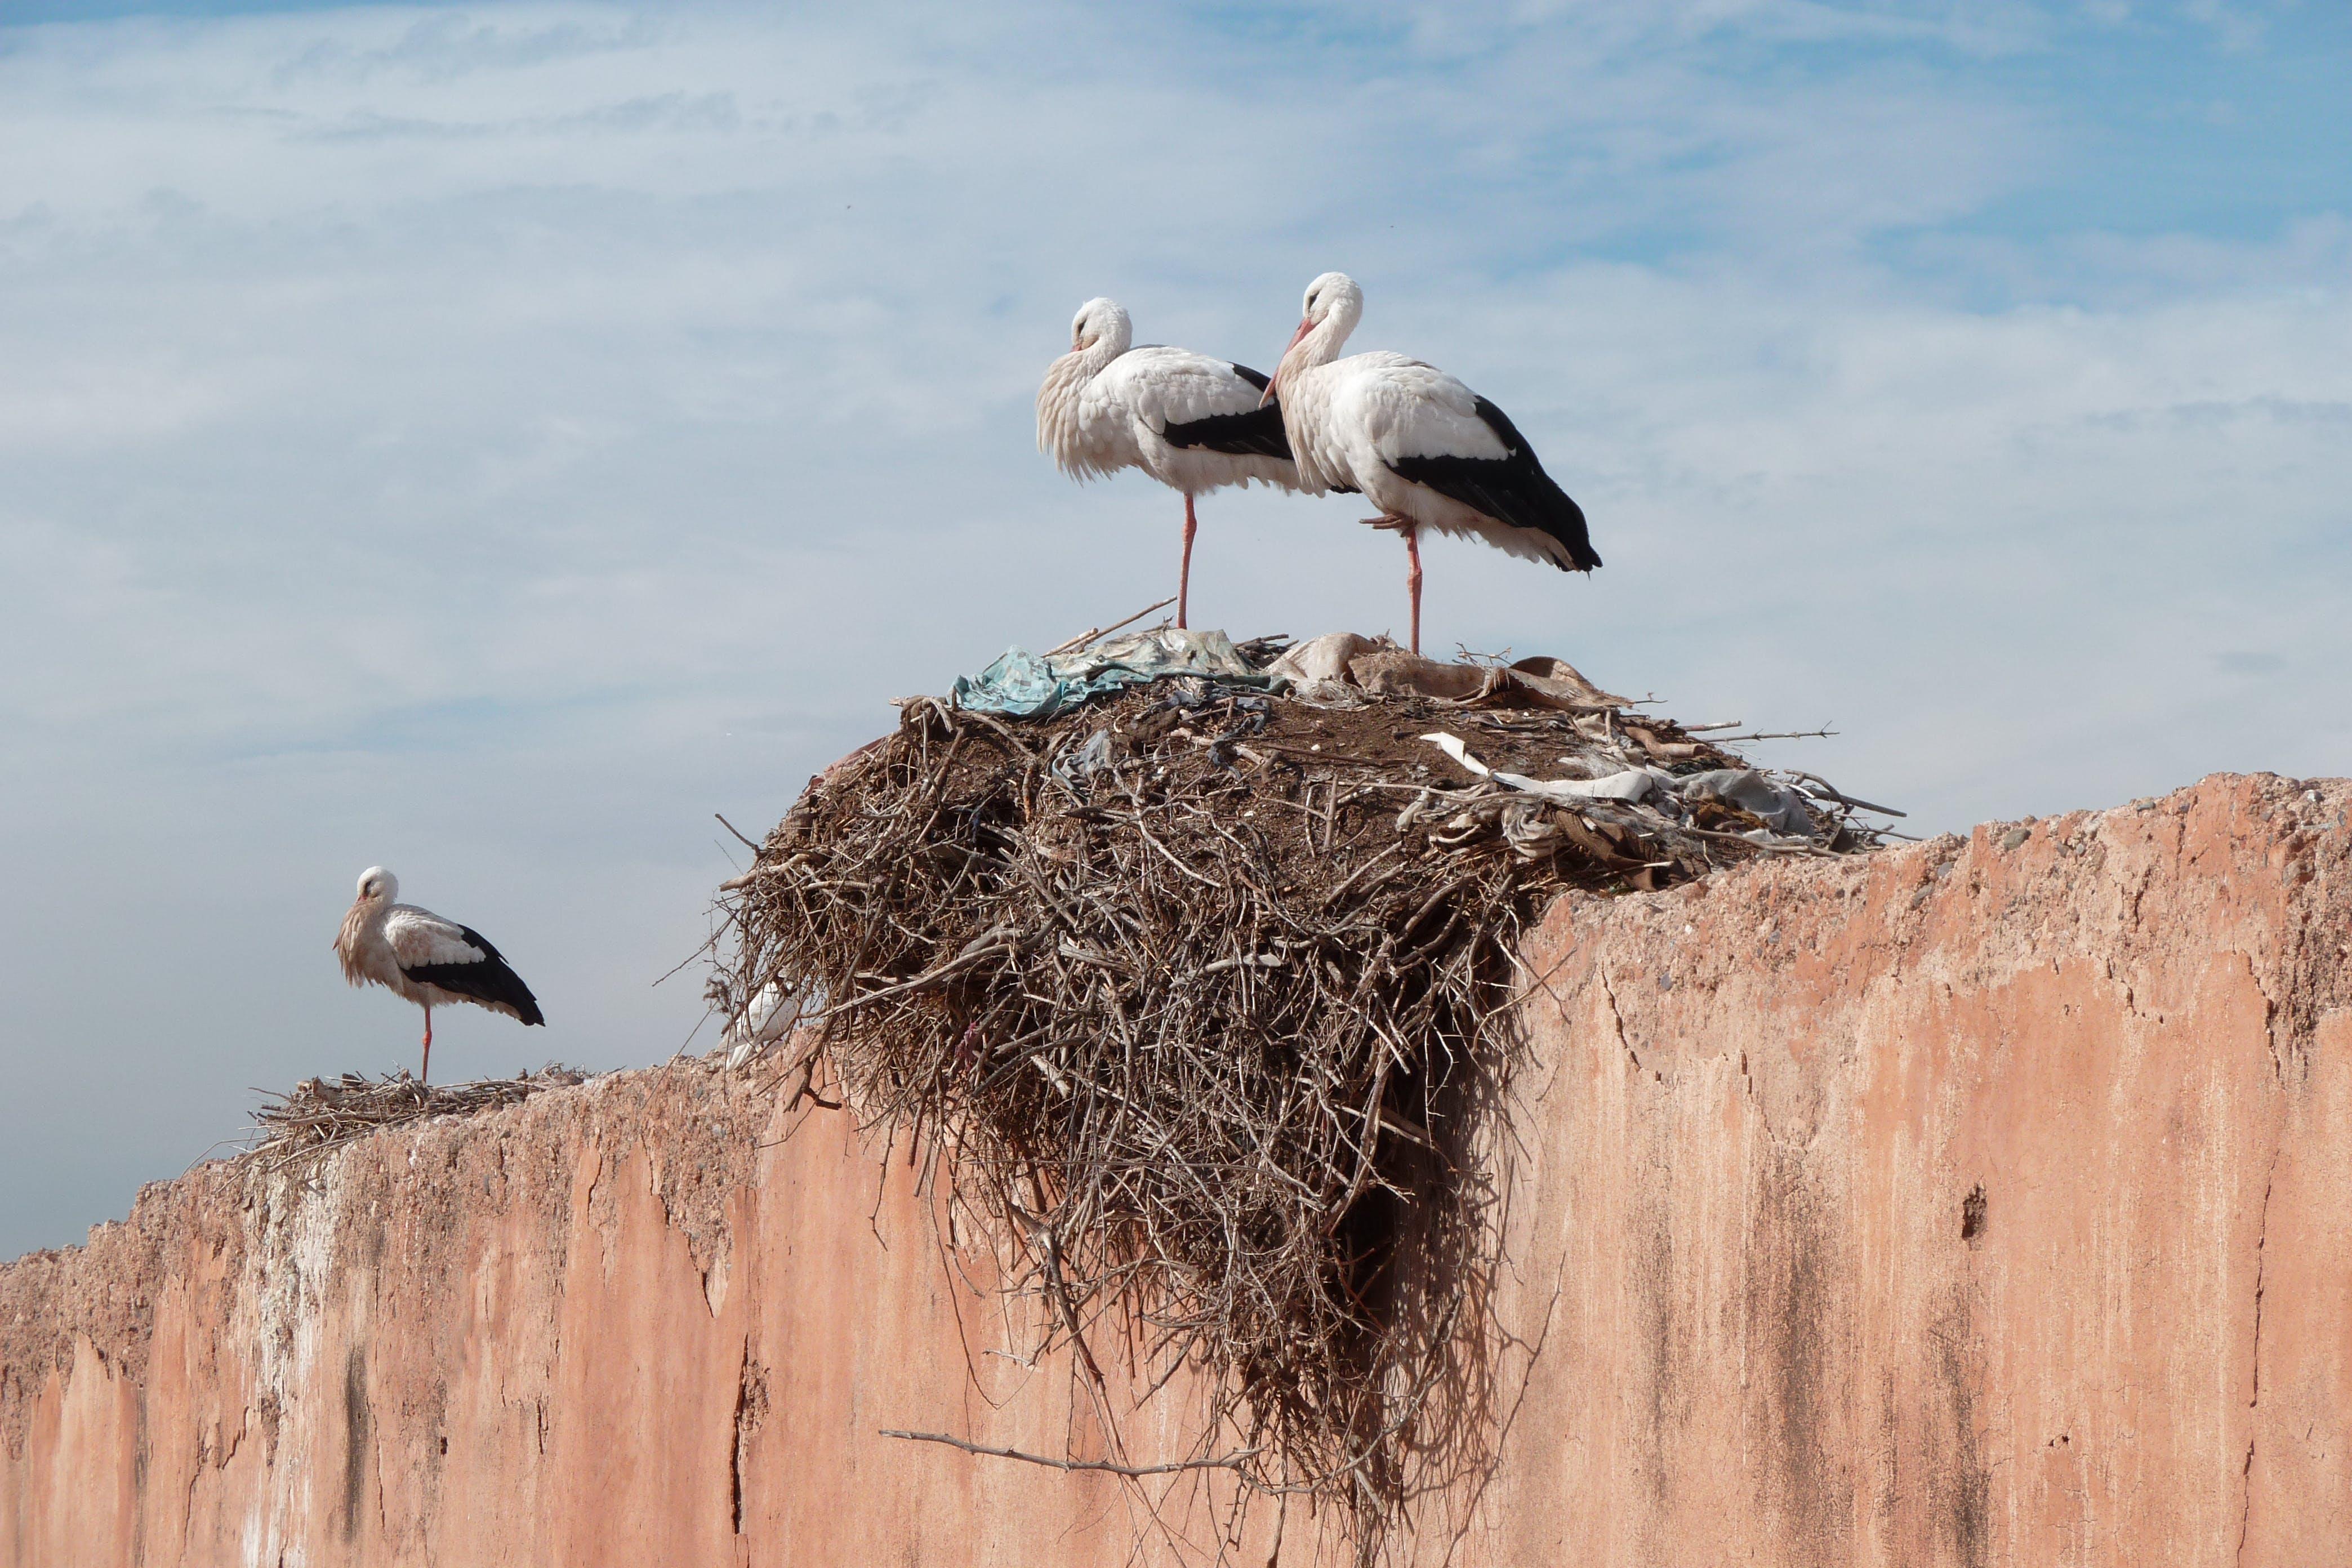 Two Birds on the Bird's Nest Under White Clouds